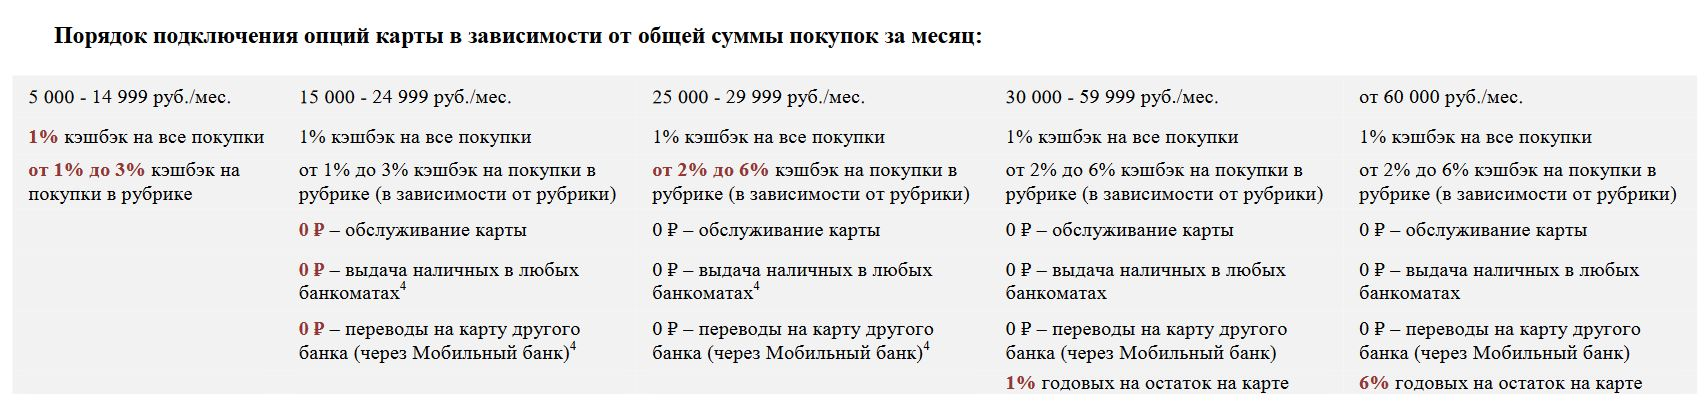 Кэшбэк-карта ПОРА УБРиР